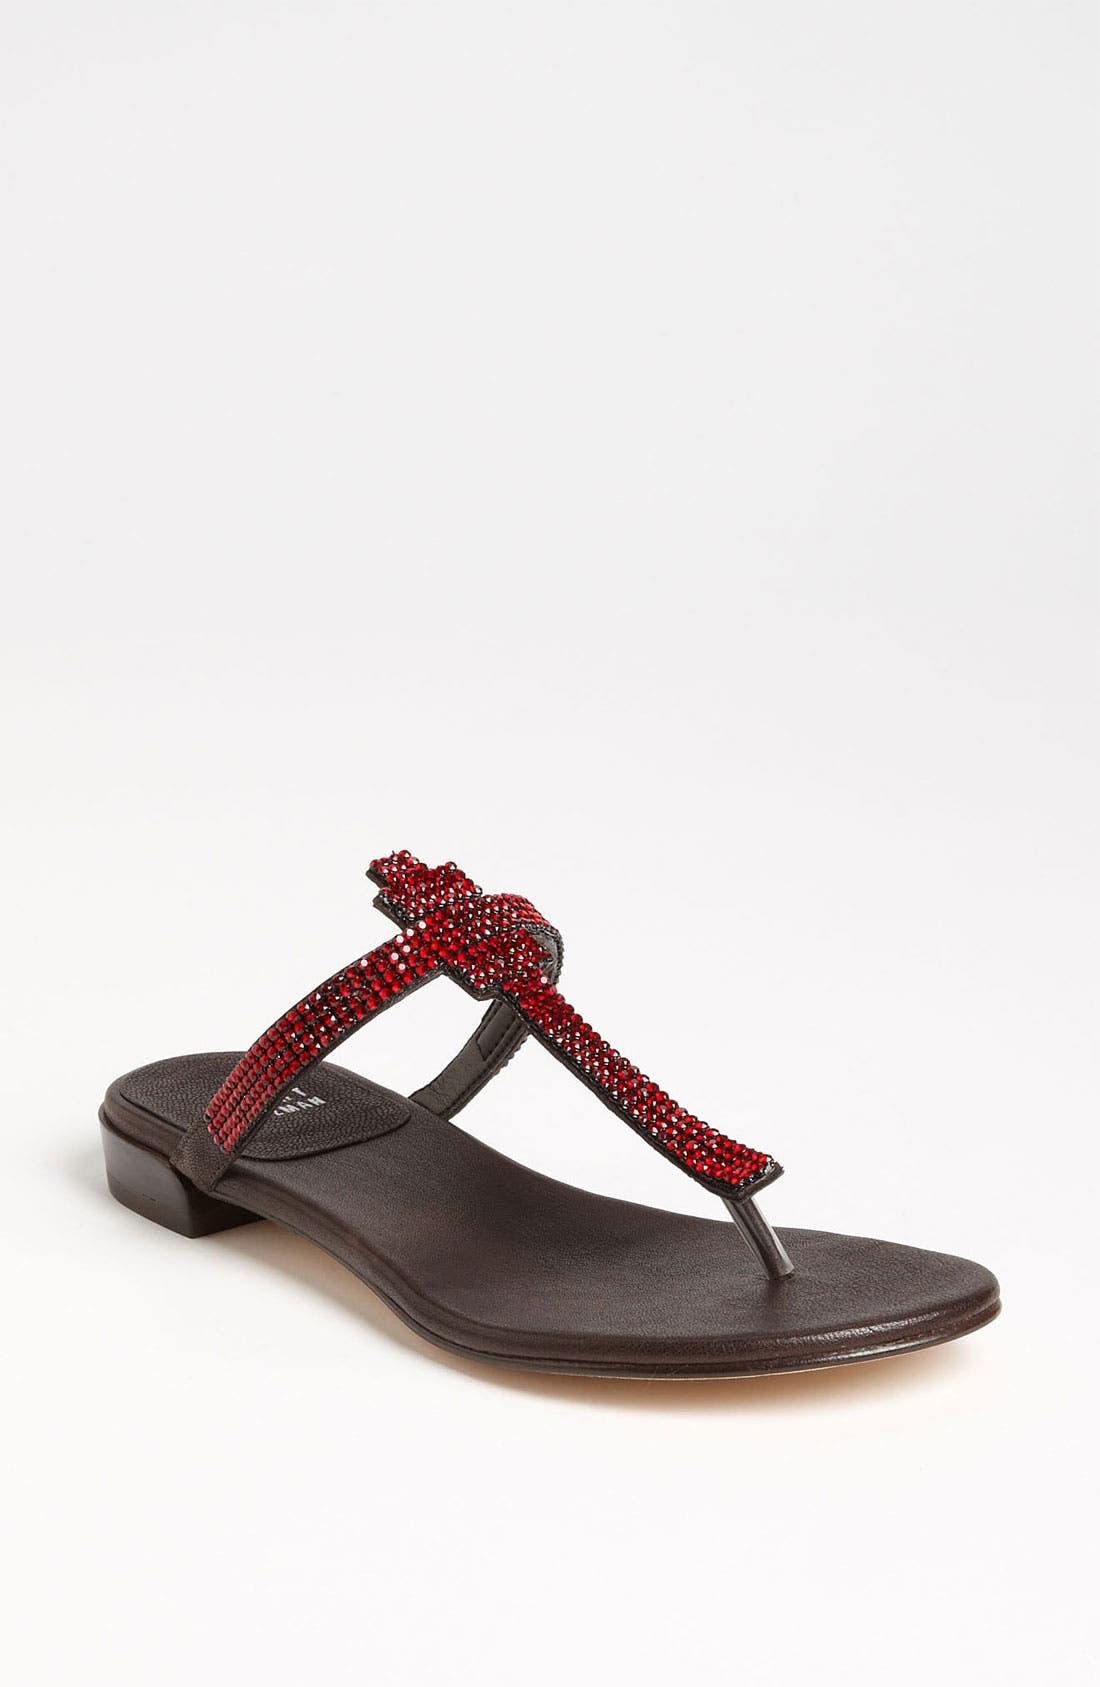 Alternate Image 1 Selected - Stuart Weitzman 'Vanity' Sandal